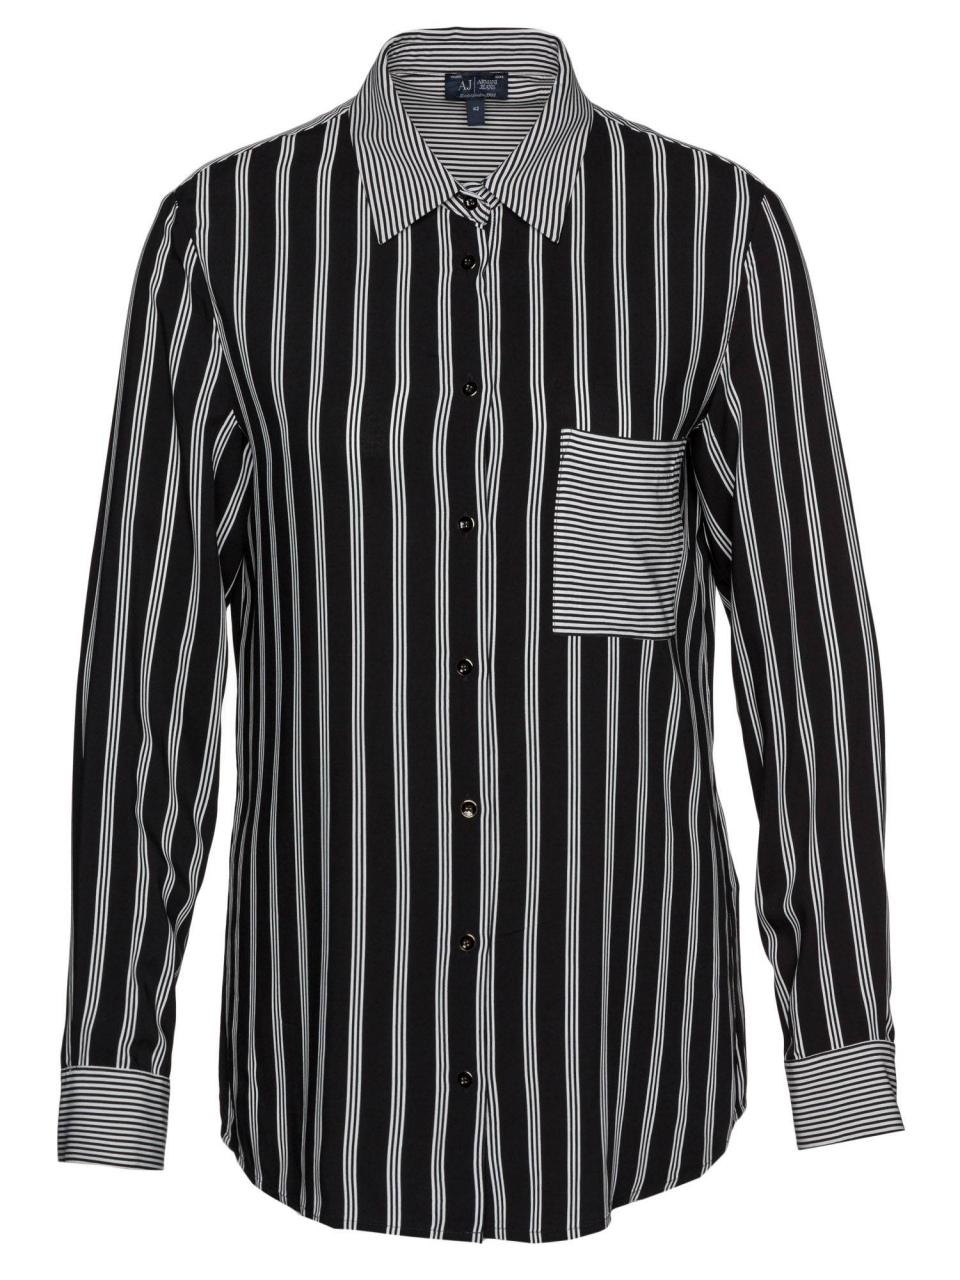 ARMANI JEANS Bluse Shirt